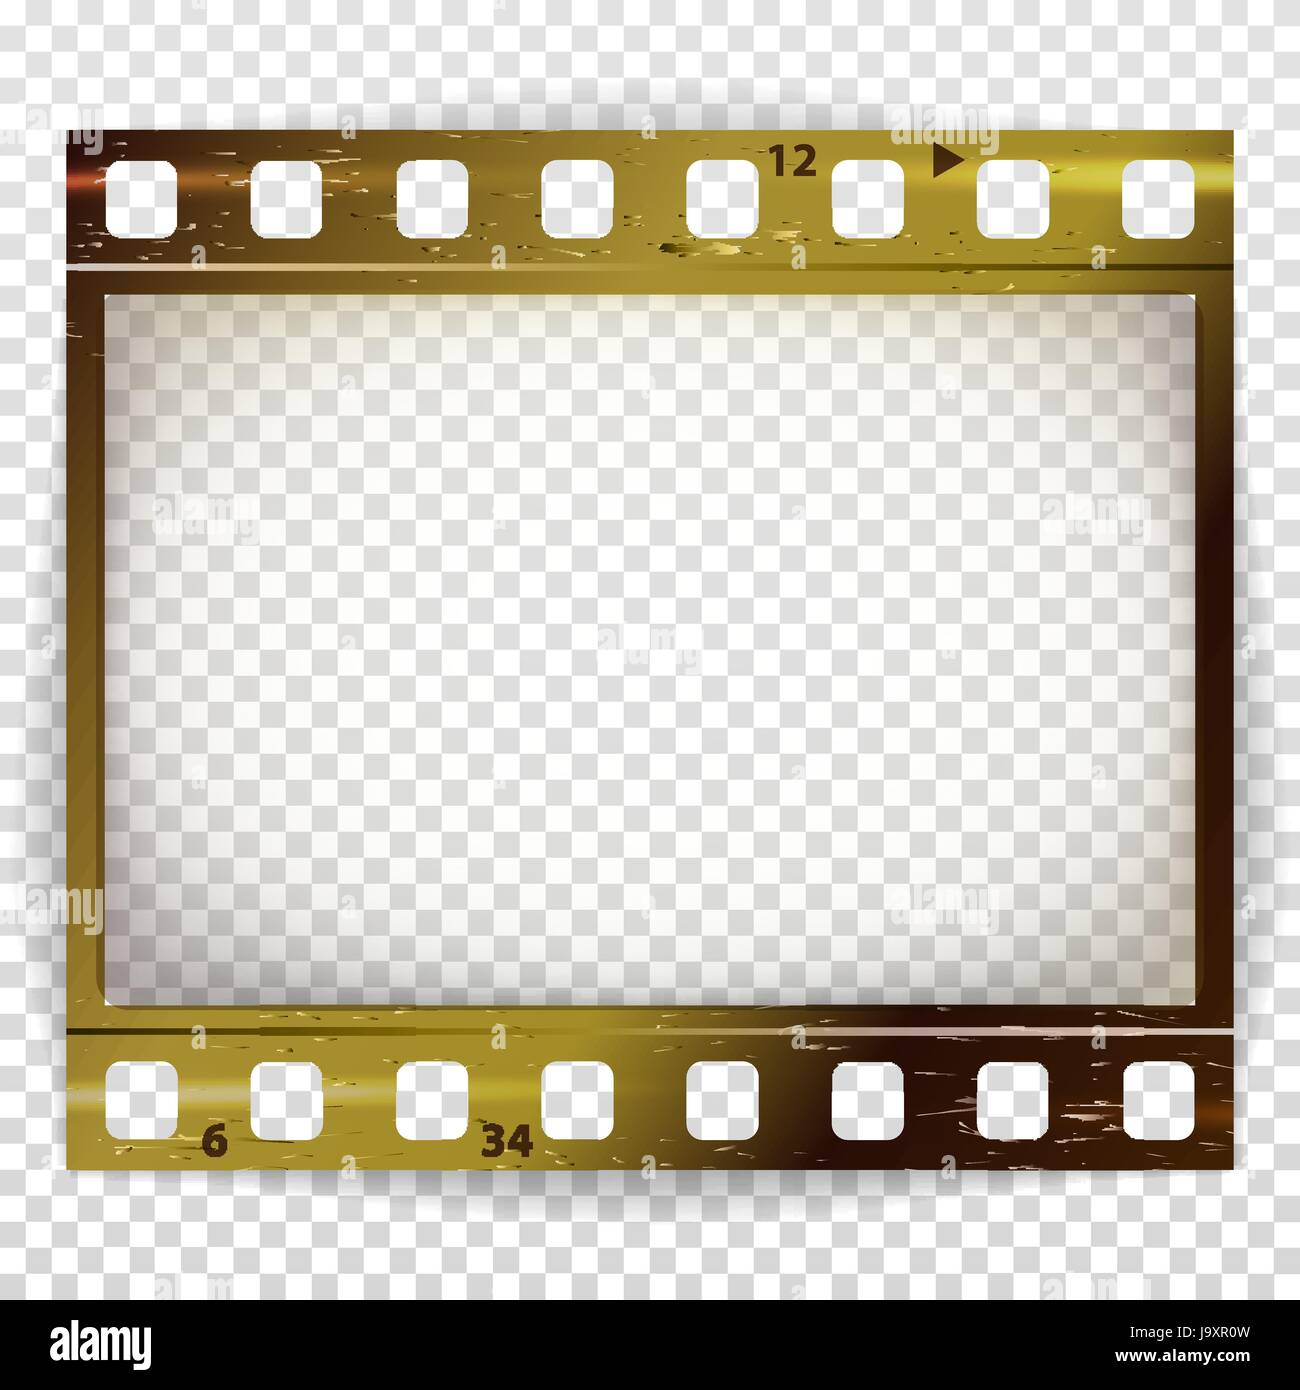 Vistoso Framing En Película Ornamento - Ideas Personalizadas de ...